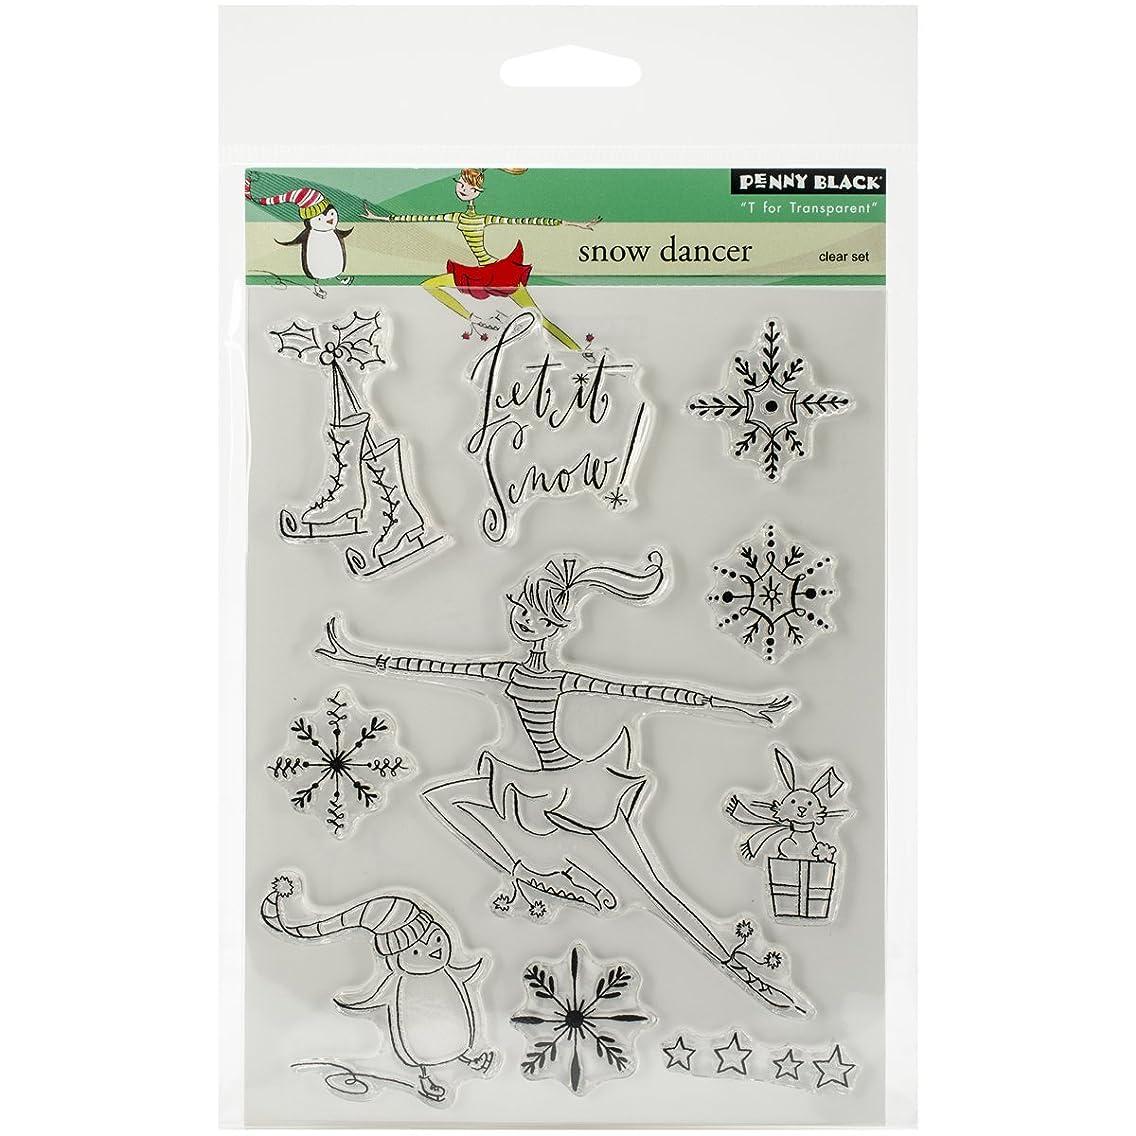 Penny Black Decorative Rubber Stamps, Snow Dancer